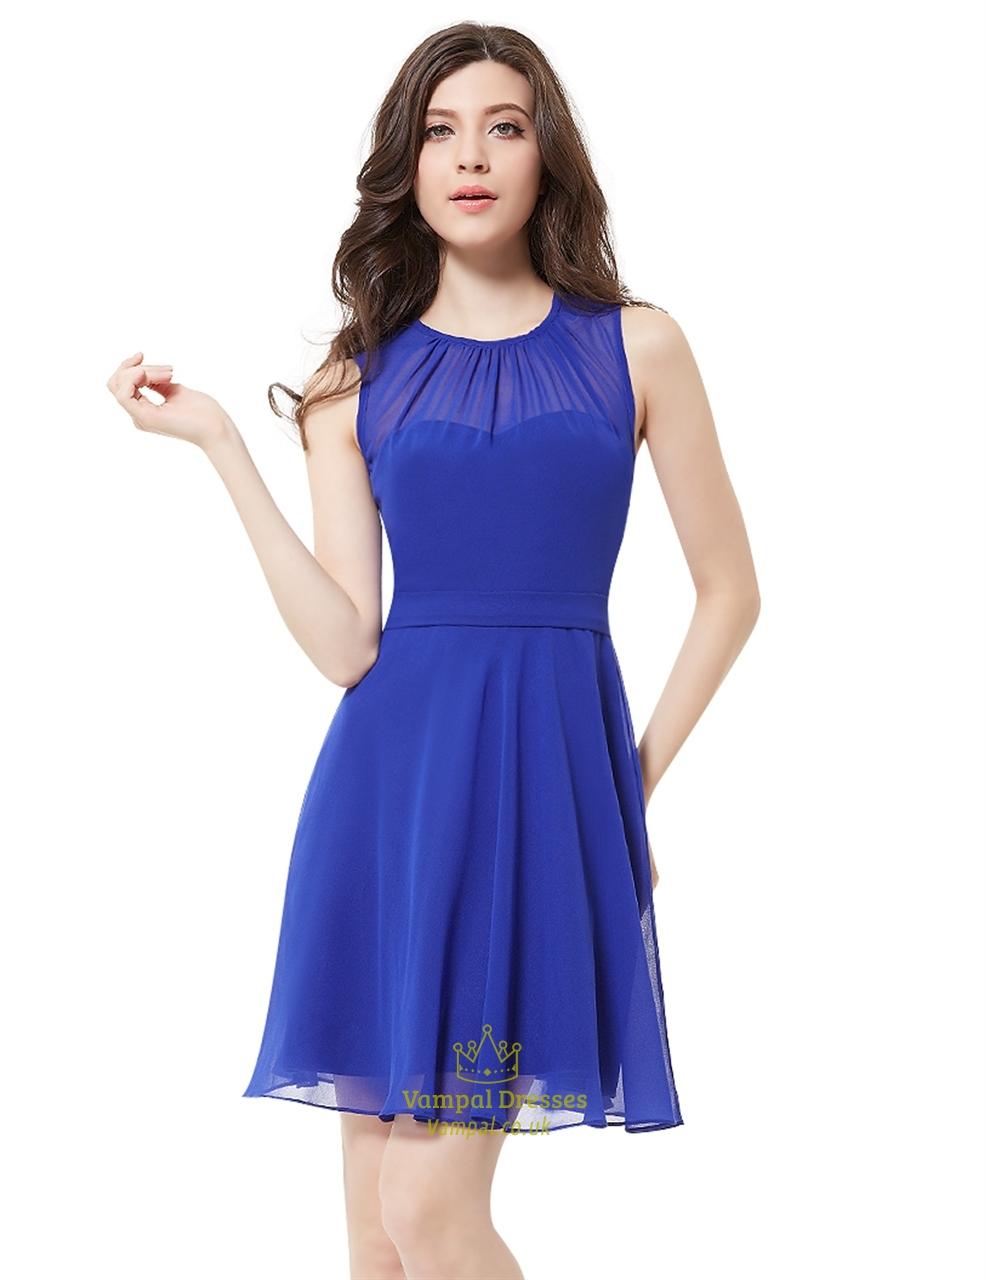 Elegant Royal Blue Illusion Neckline Chiffon Short